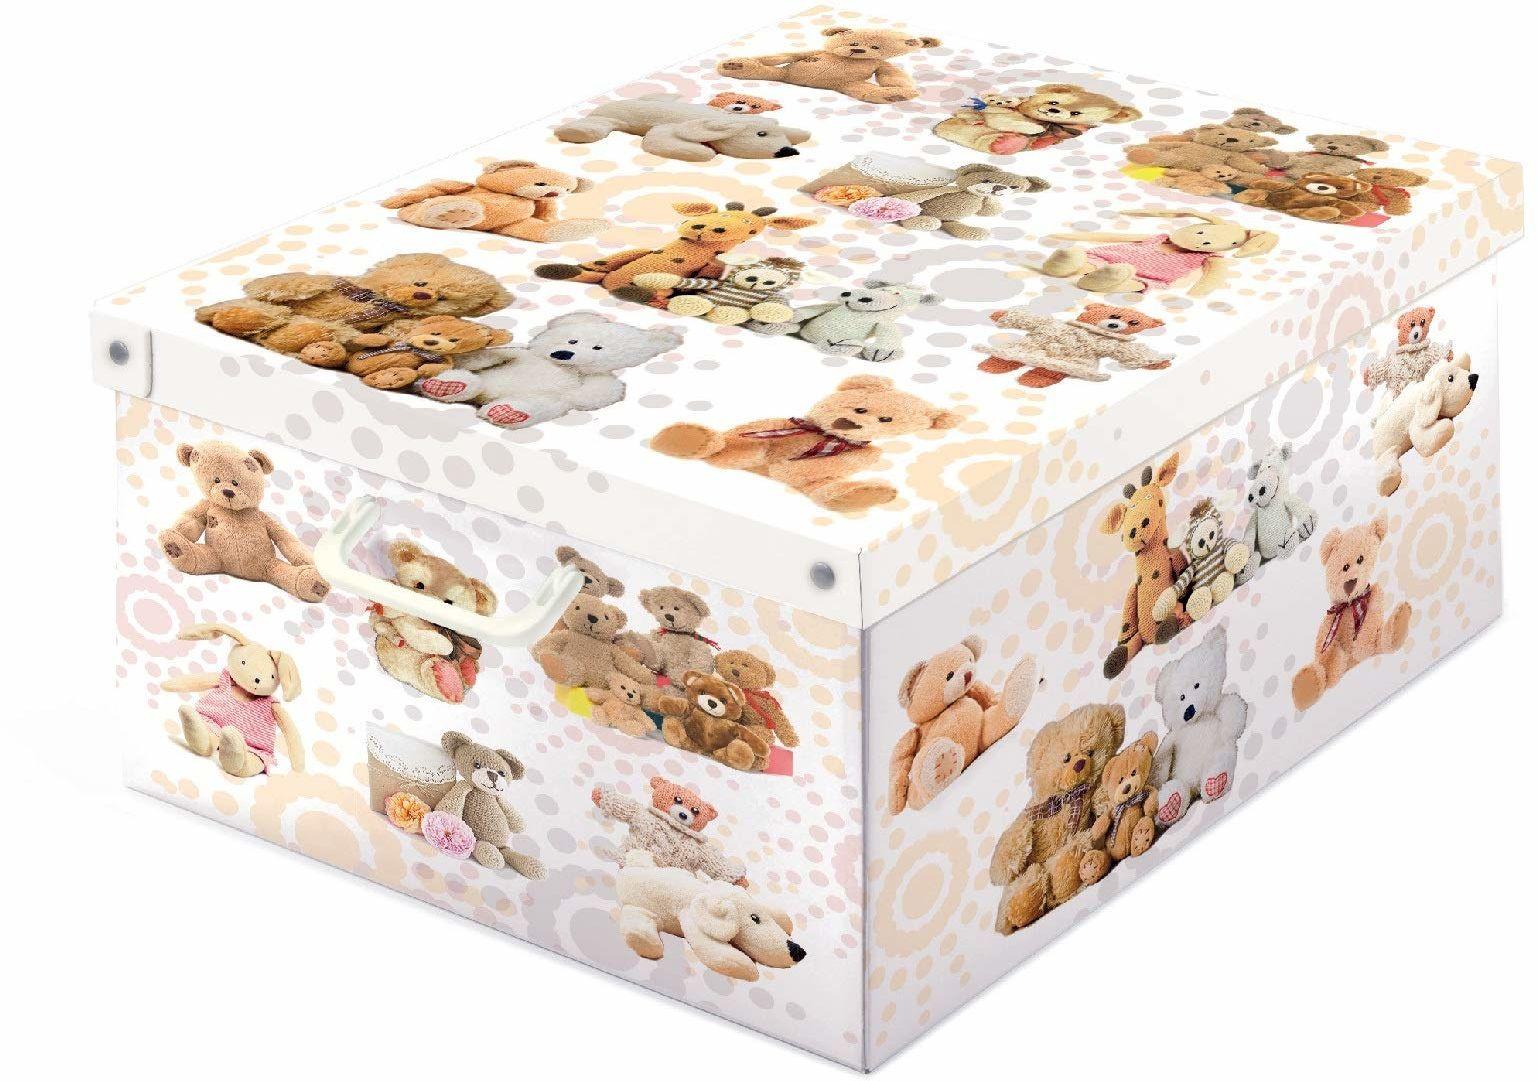 Kanguru la coperta con le maniche Collection PELUCHES pudełko do przechowywania, wielokolorowe, 39 x 50 x 24 cm